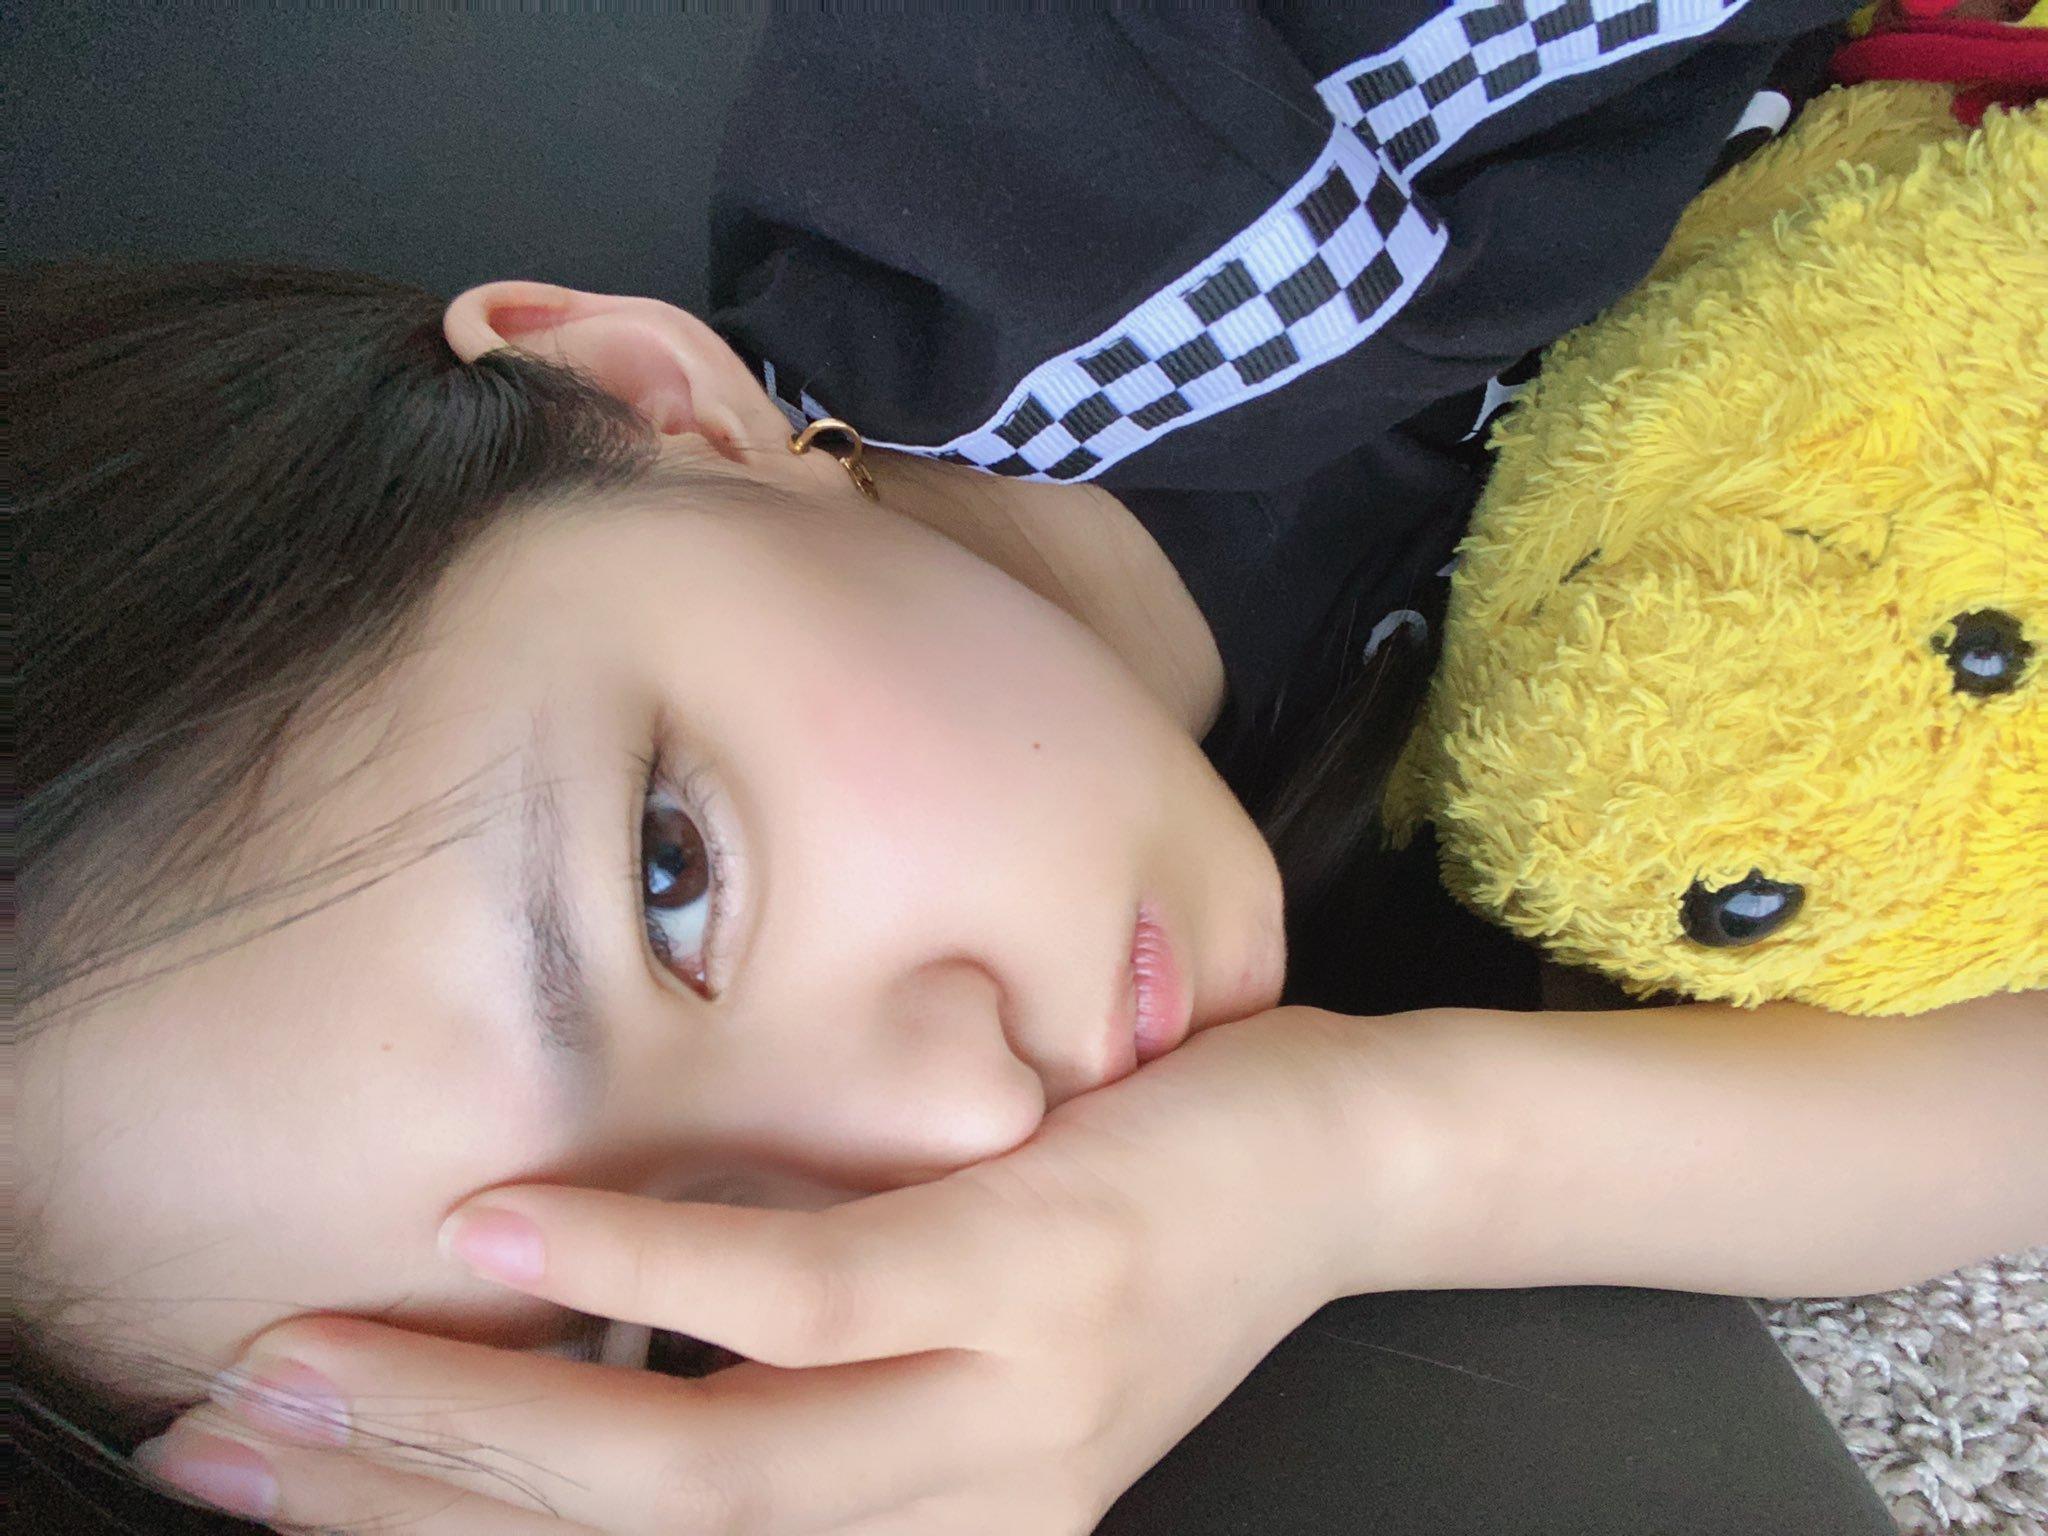 nagisa_micky 1253079773066084352_p0